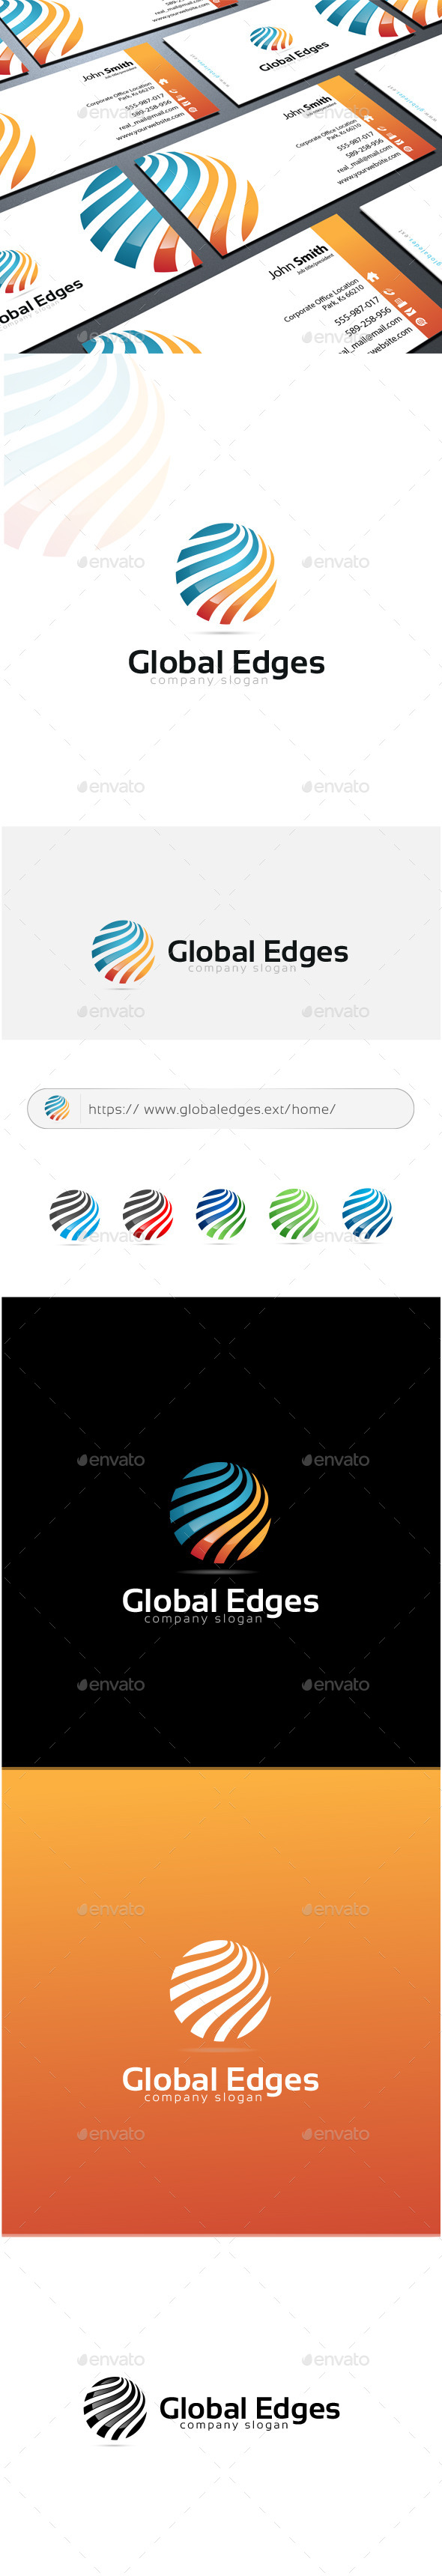 GraphicRiver Global Edges Logo 11334621